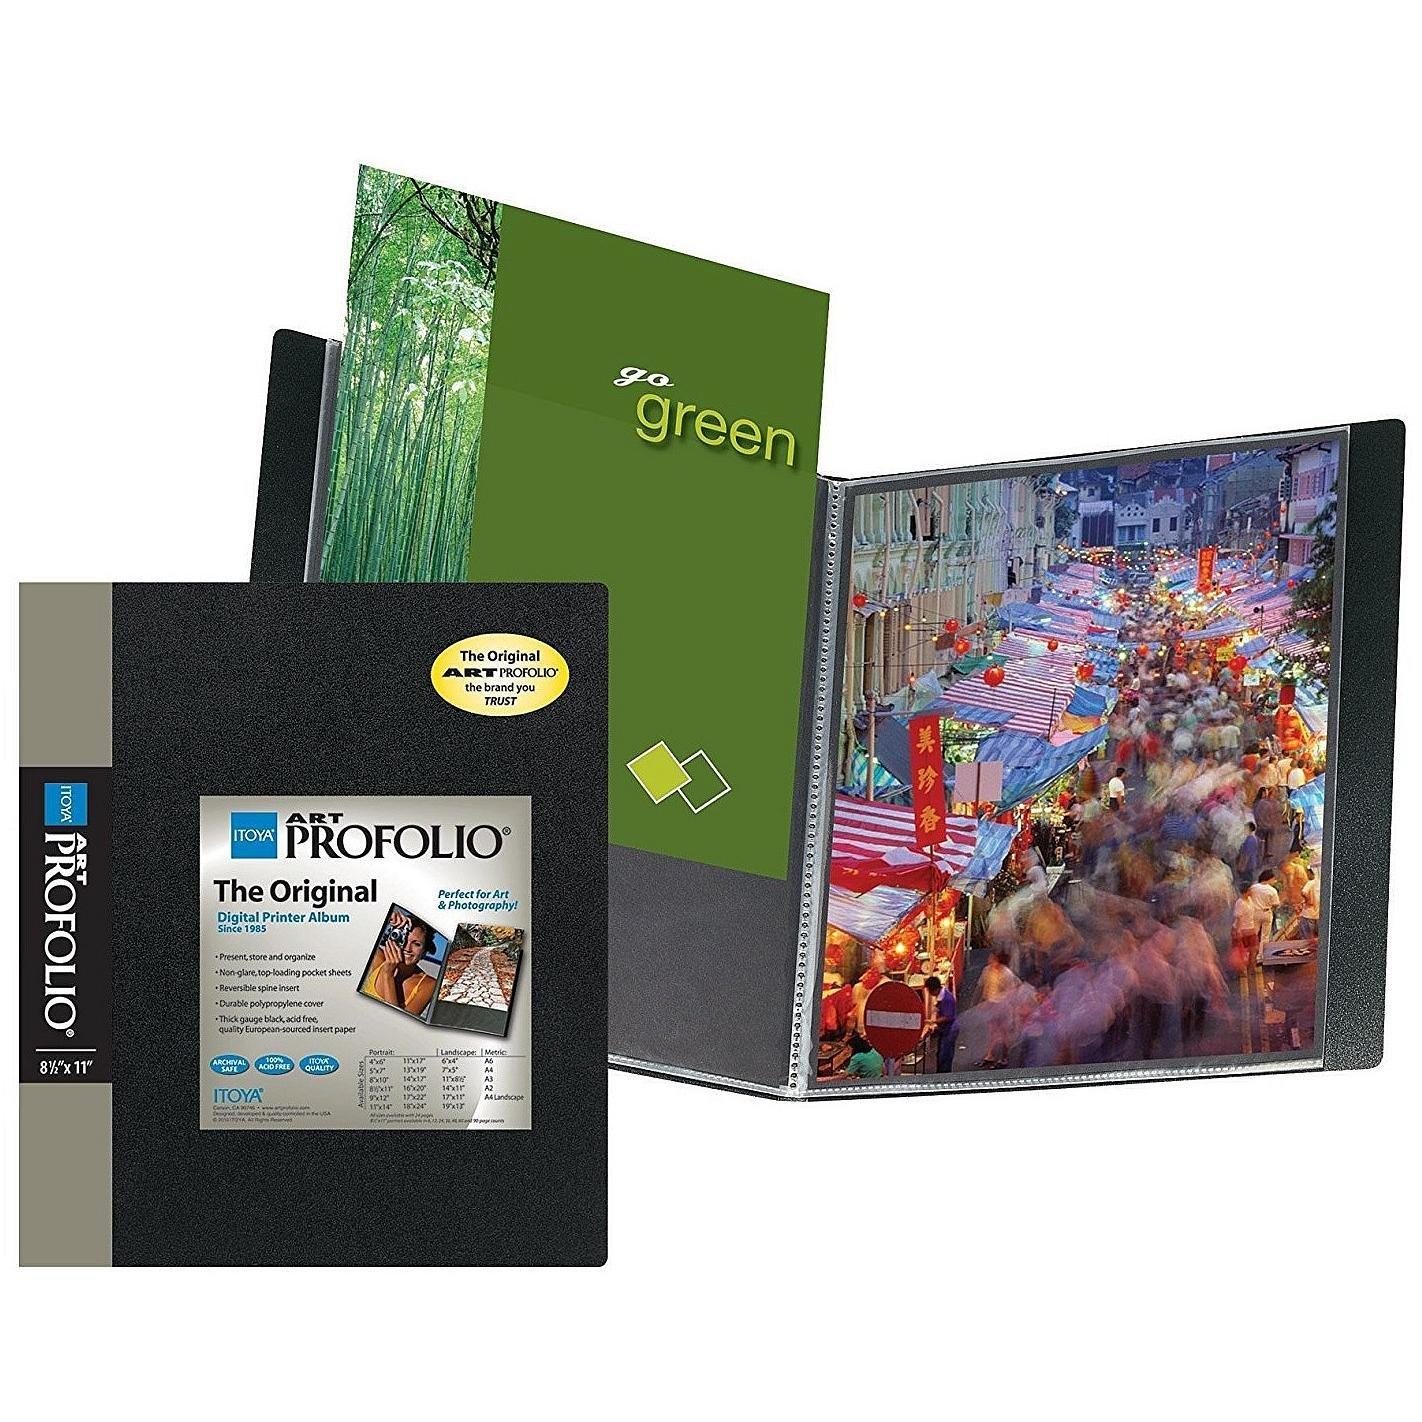 Amazoncom Itoya Art Profolio Storagedisplay Book 8 12 In X 11 In